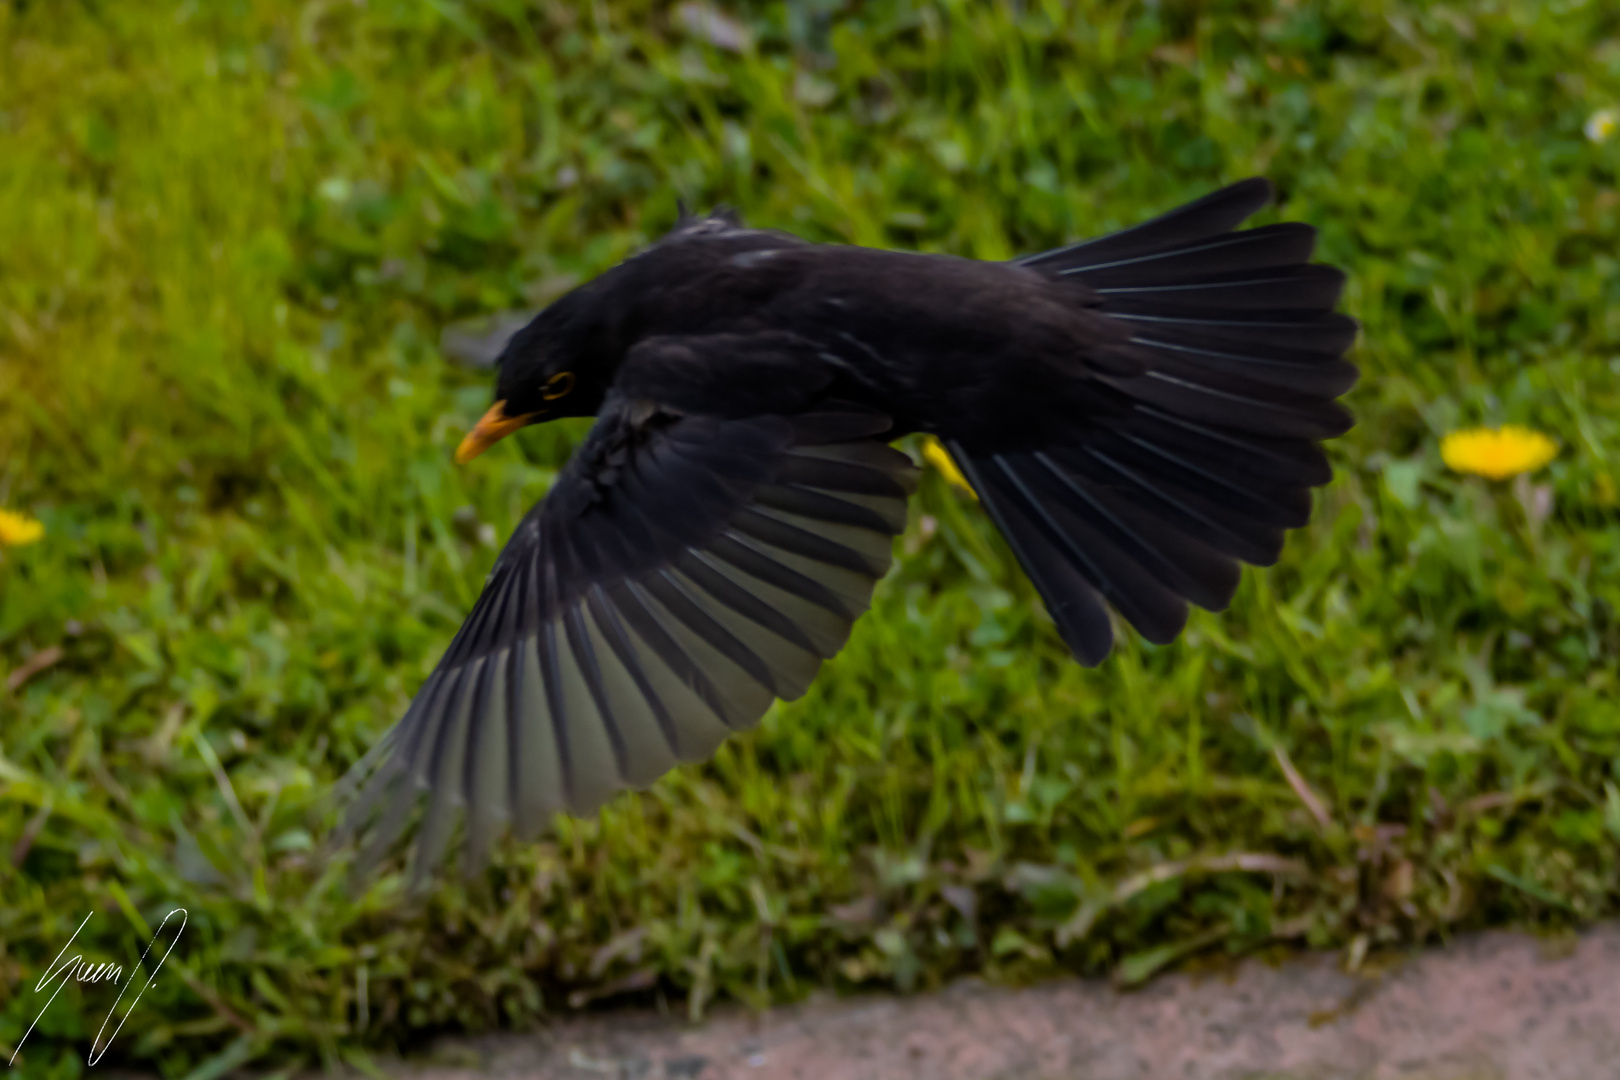 amsel im flug foto bild natur vogel tiere bilder auf. Black Bedroom Furniture Sets. Home Design Ideas